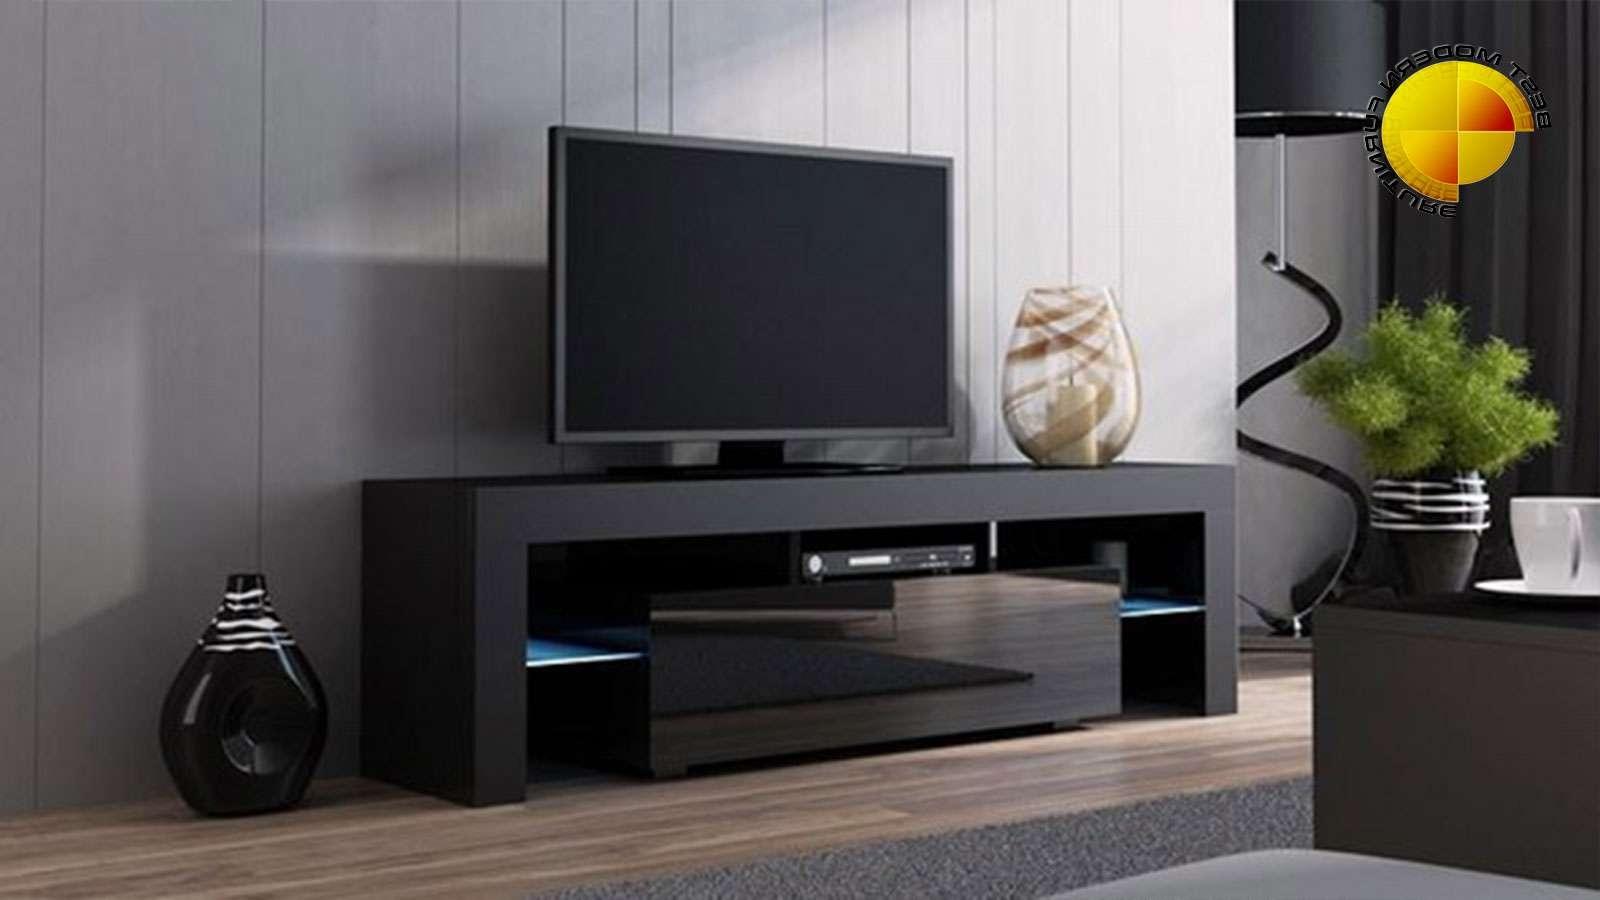 Modern Tv Stand 160cm High Gloss Cabinet Rgb Led Lights Black Unit Inside Modern Tv Cabinets (View 3 of 20)